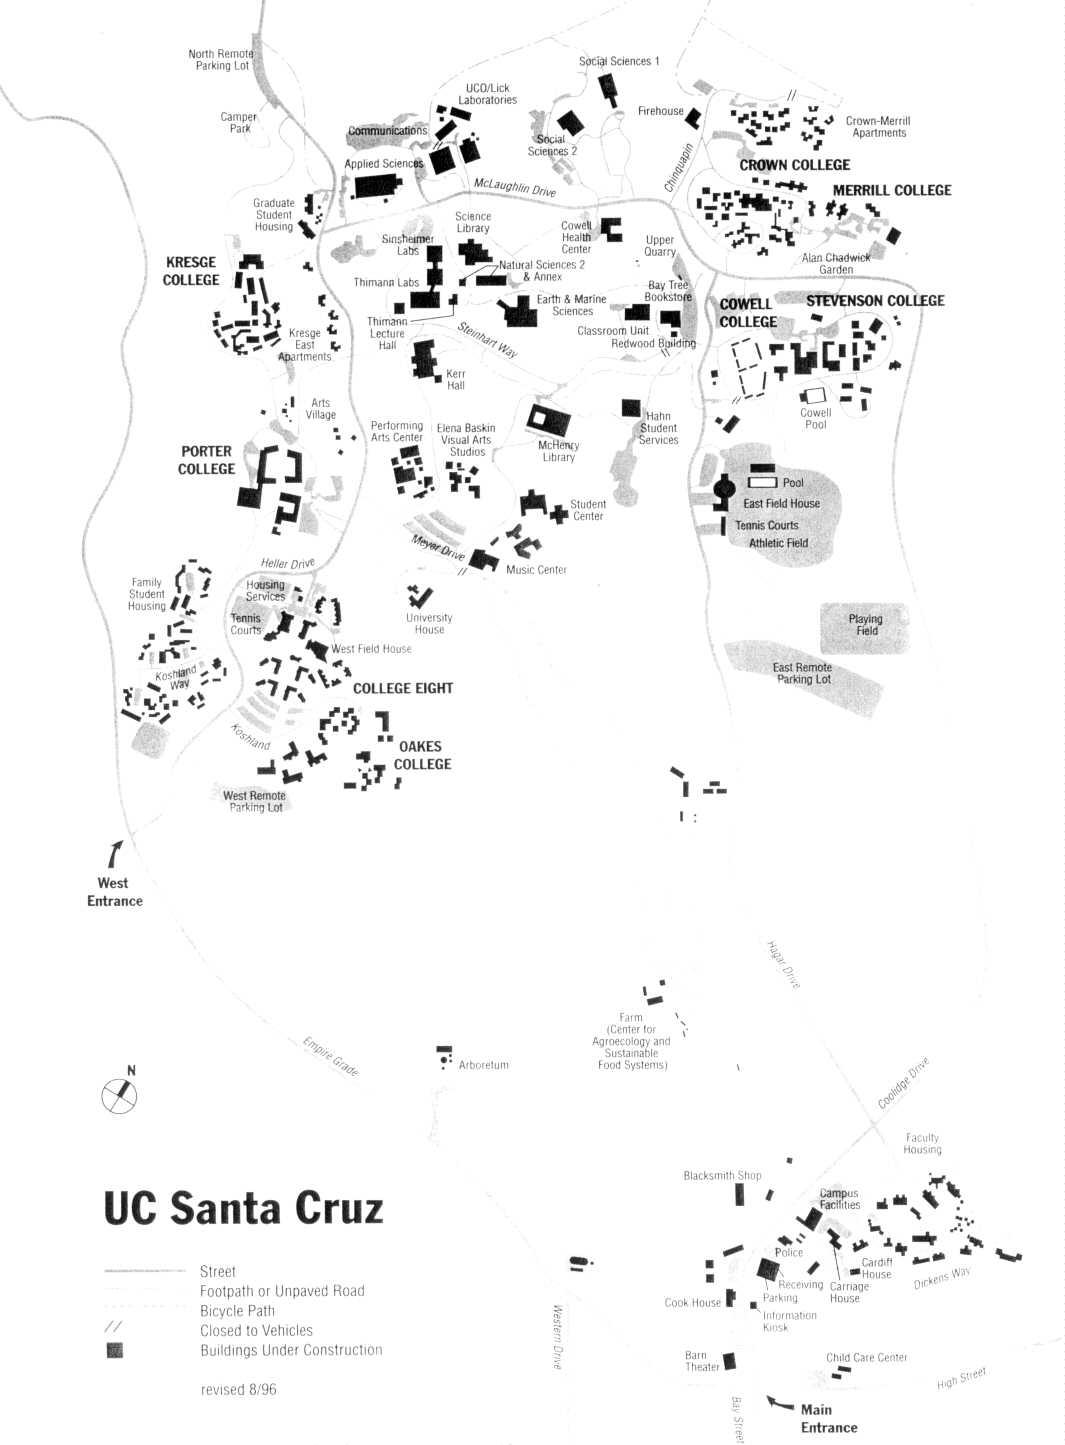 santa cruz university map Ucsc Map santa cruz university map